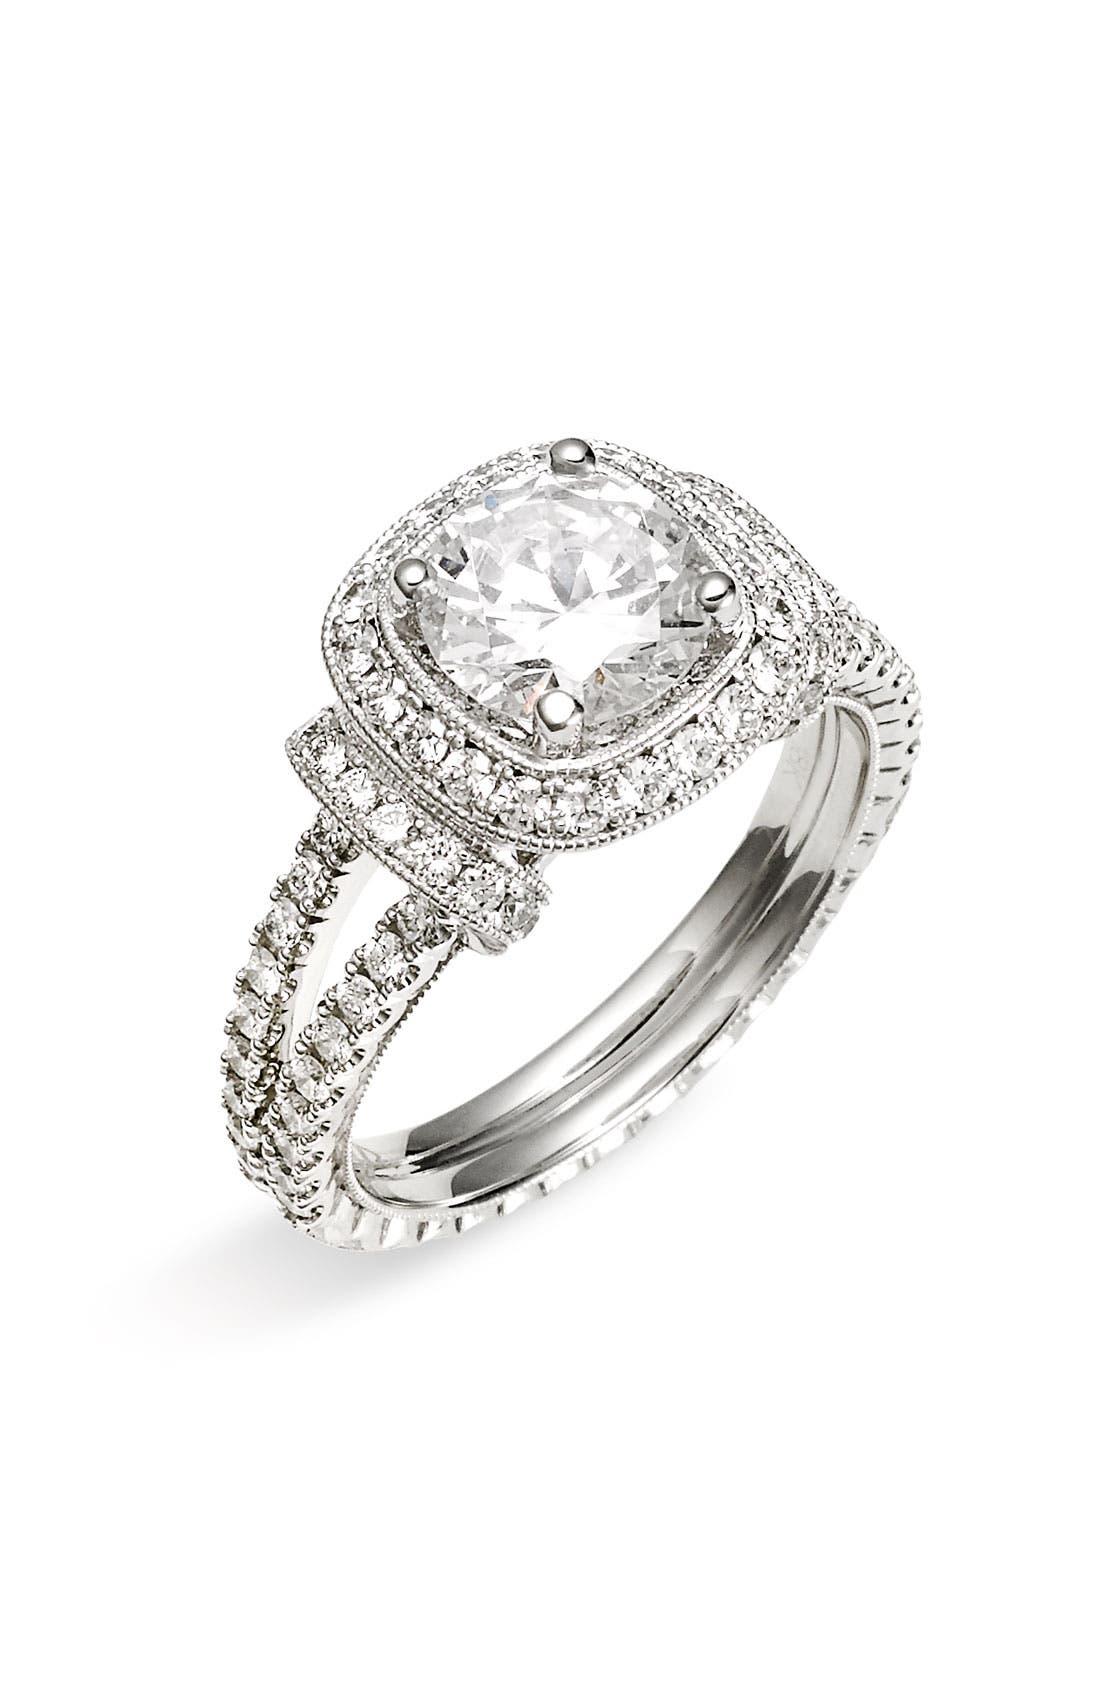 Alternate Image 1 Selected - Jack Kelége 'Romance' Cushion Set Diamond Engagement Ring Setting